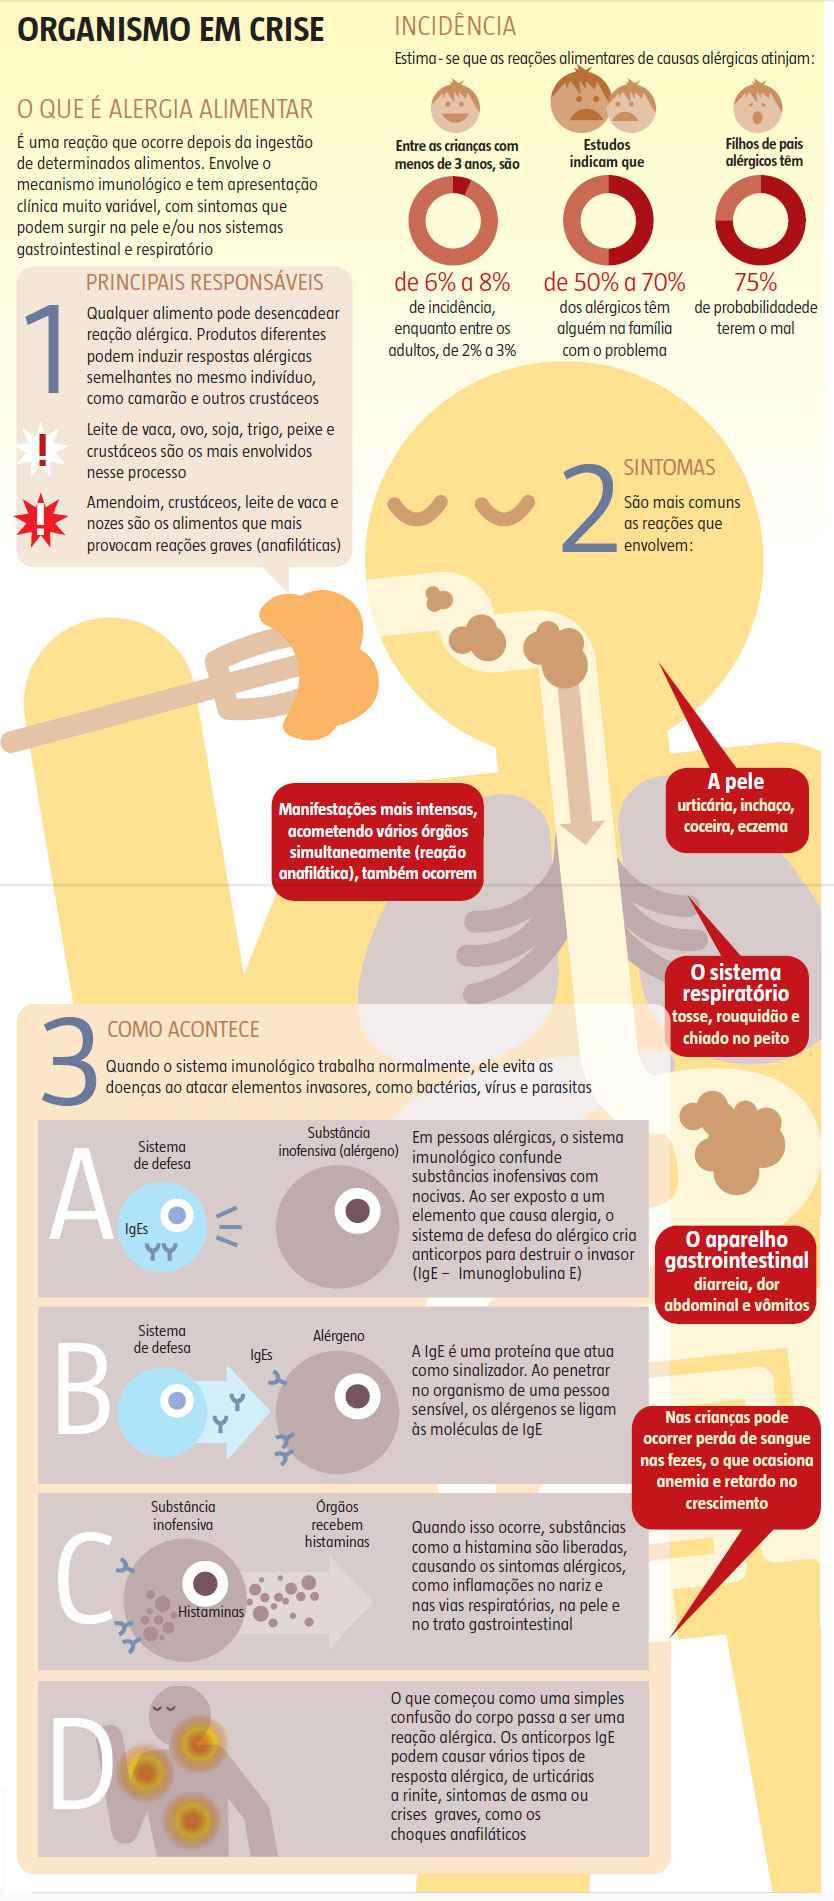 Alergia Alimentar Organismo Em Crise Alergia Alimentar Alergia Saude Do Bebe